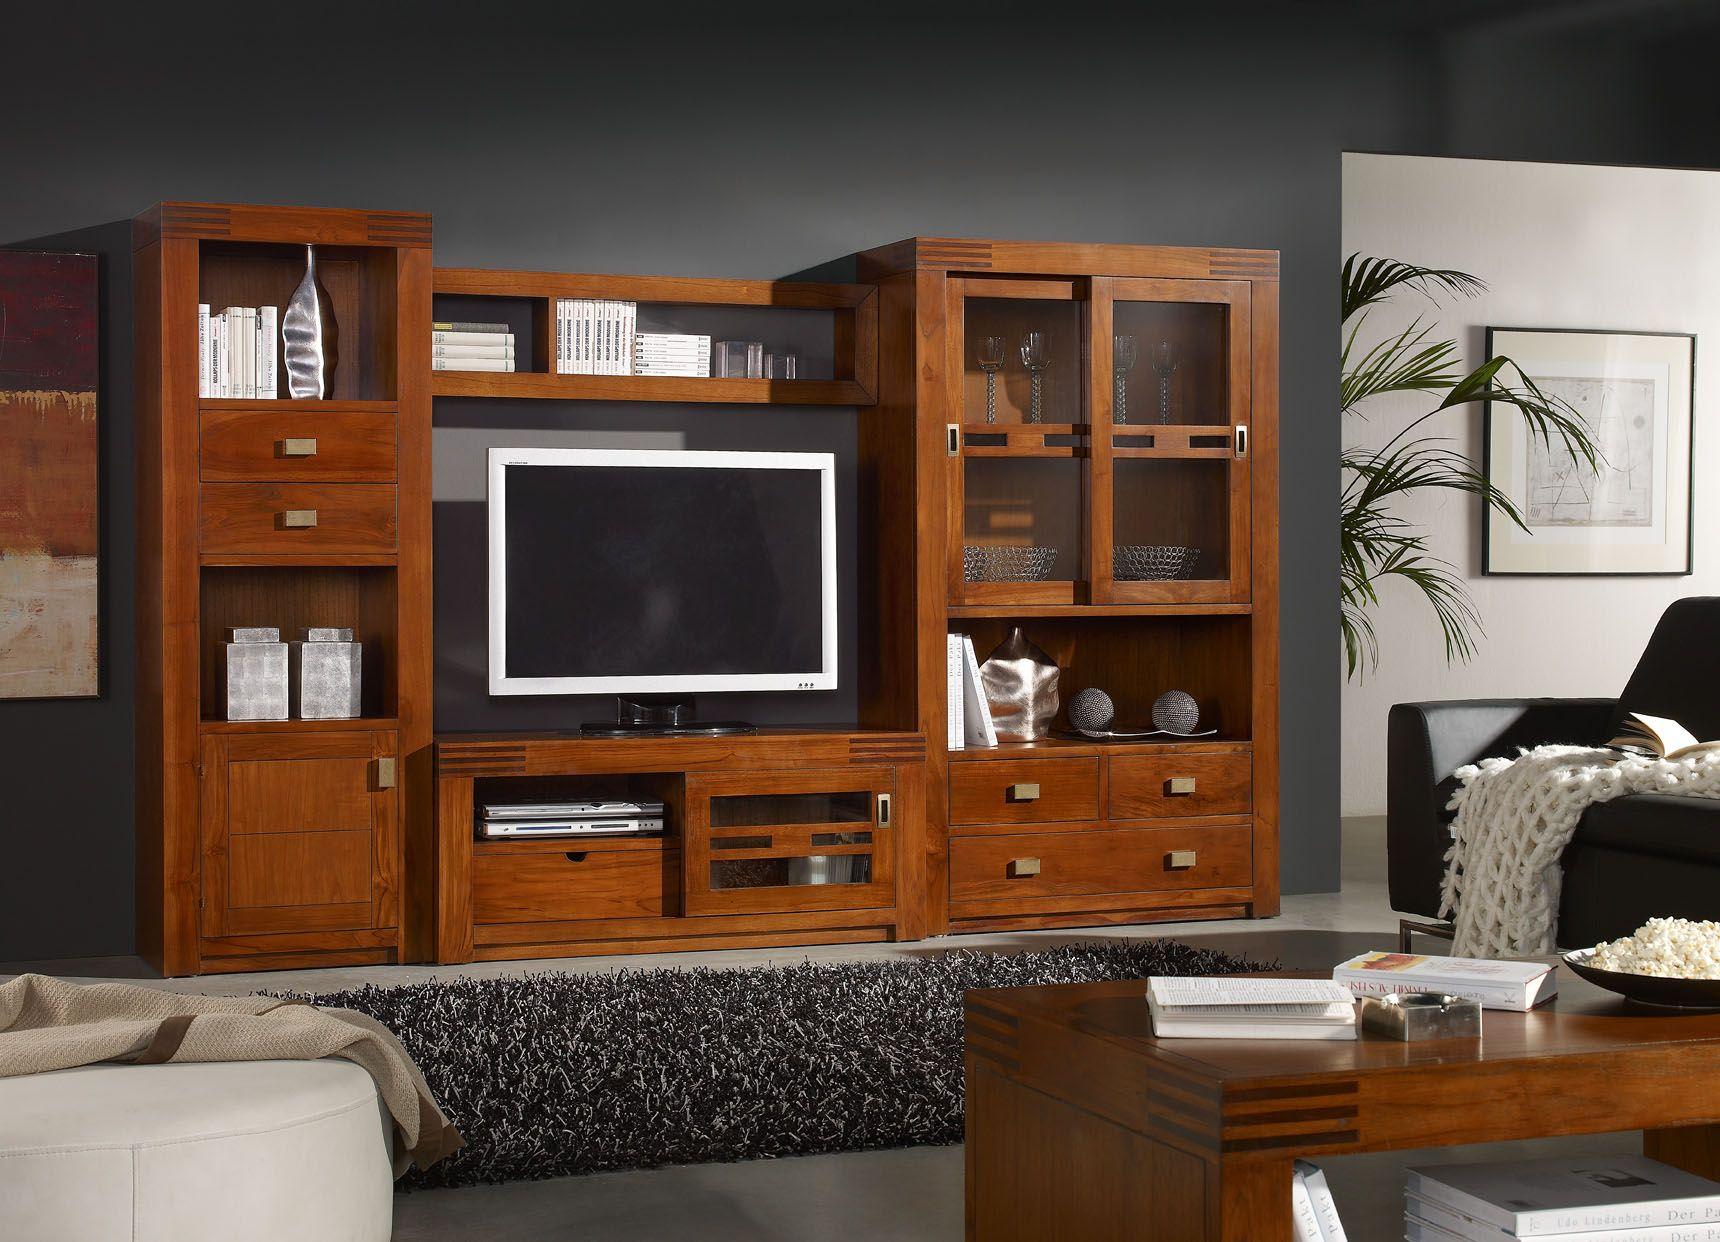 Modular colonial serie wood muebles coloniales salones - Muebles de salon colonial ...